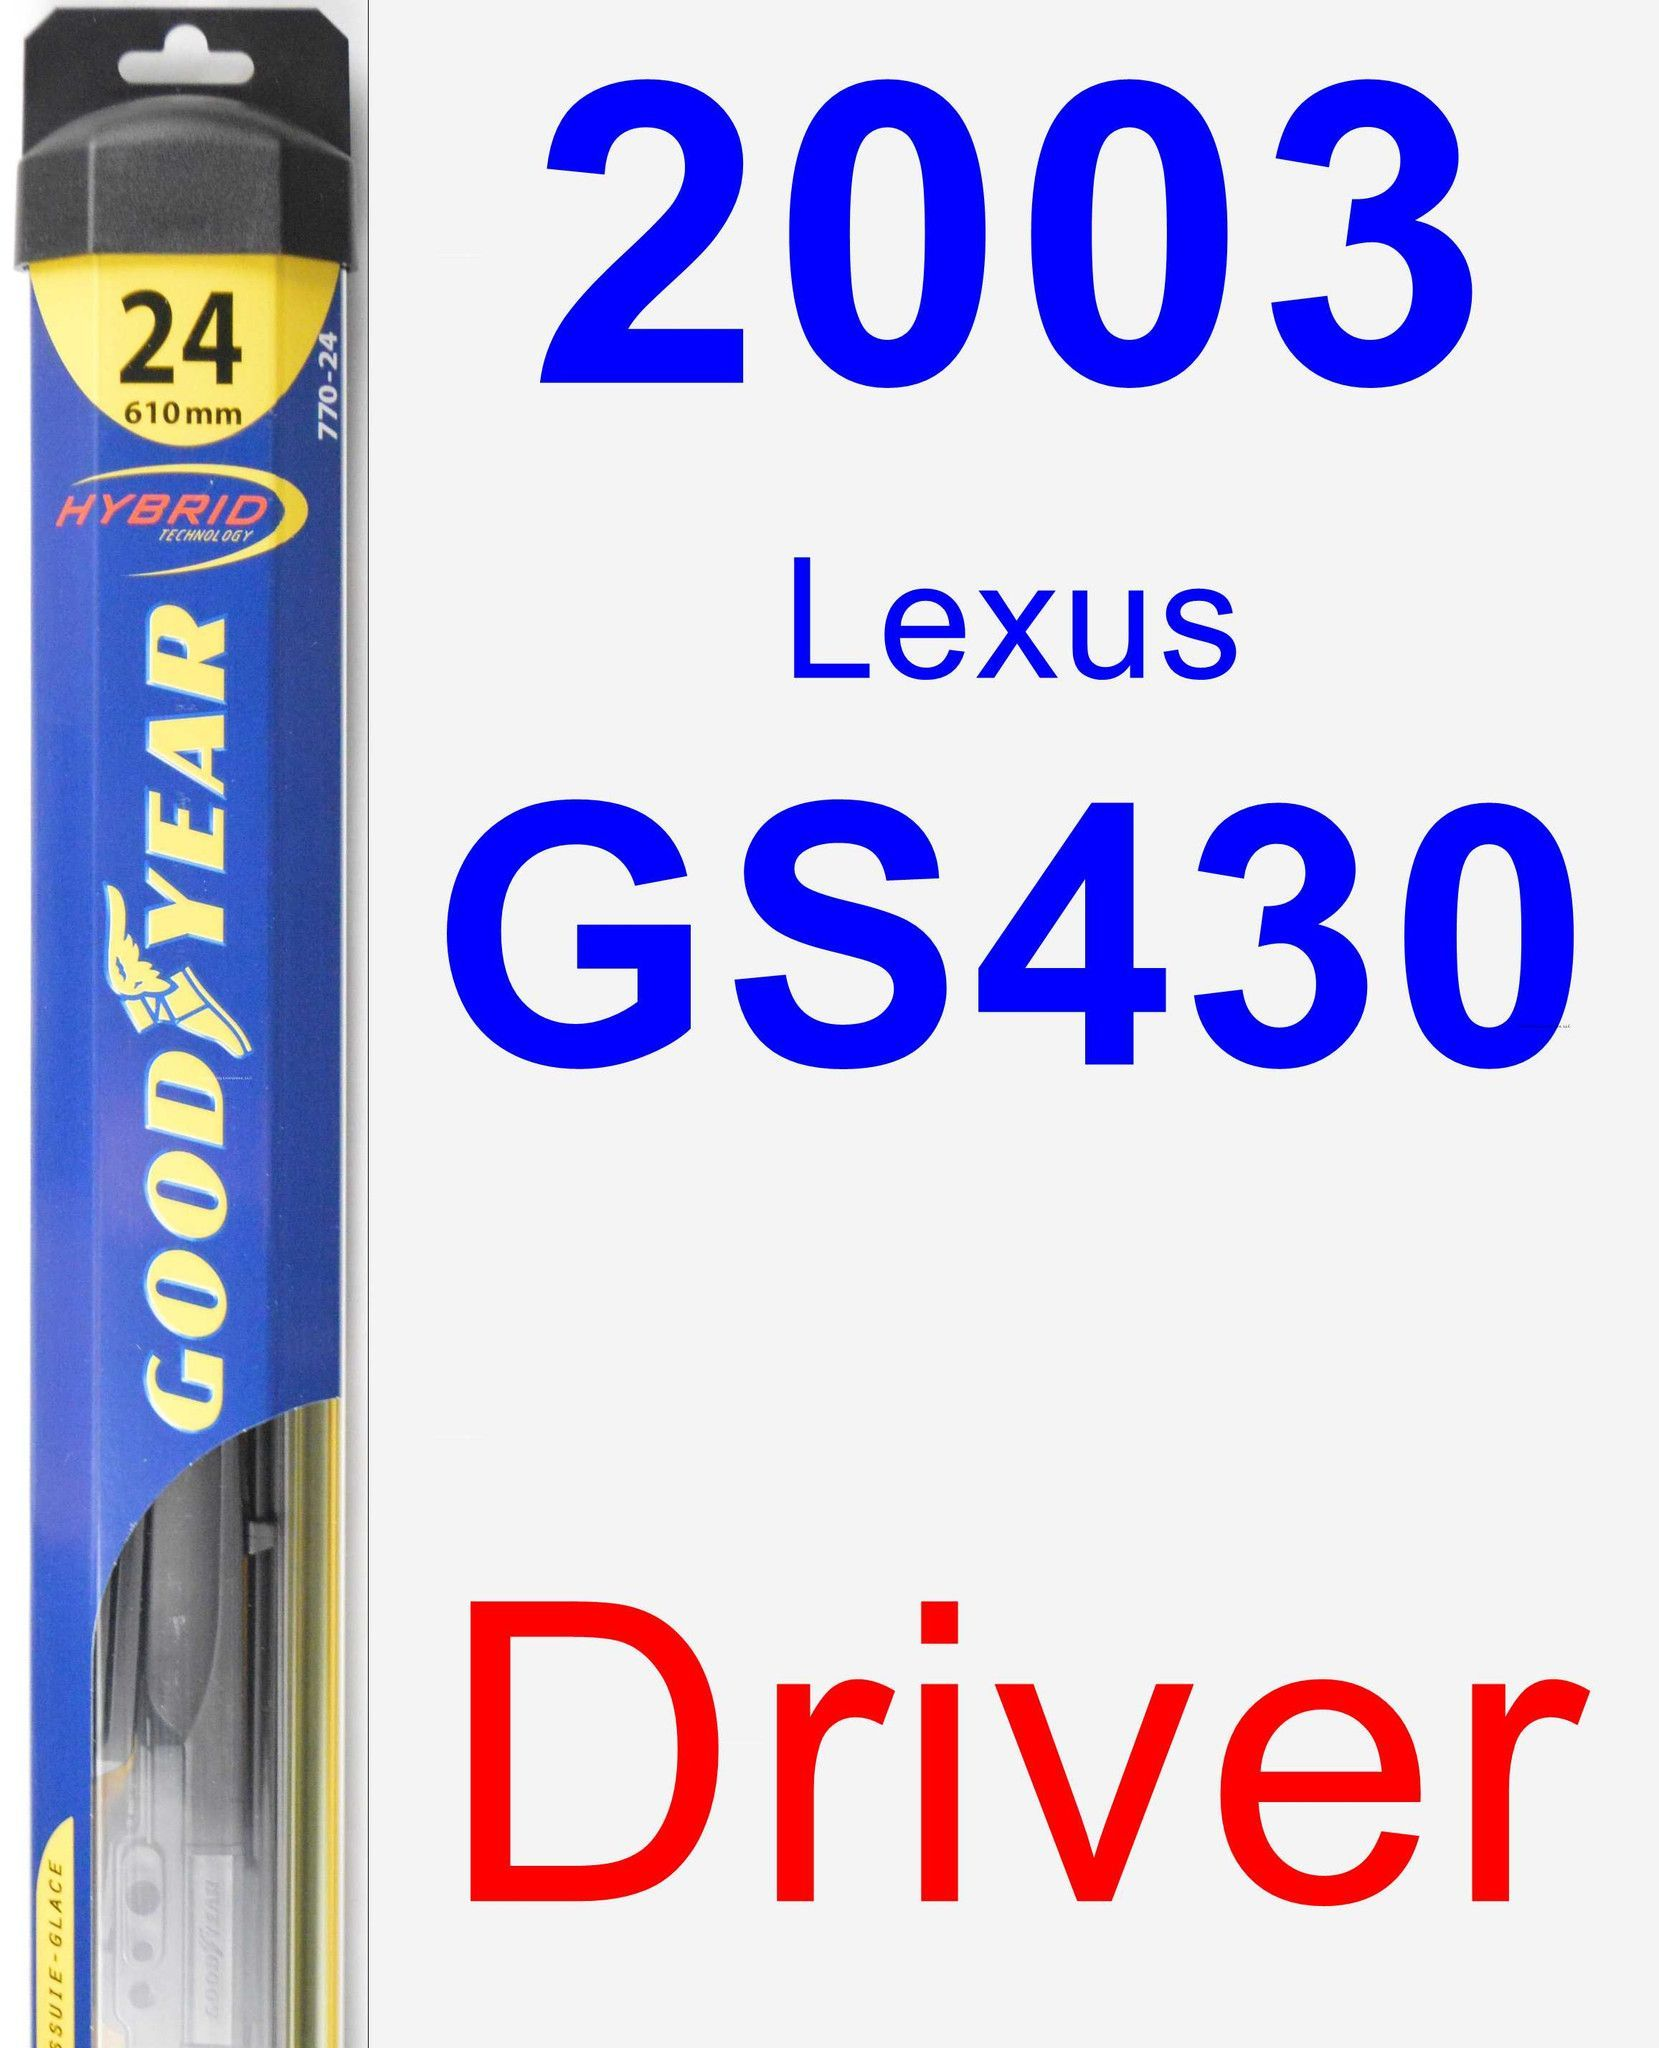 Driver Wiper Blade For 2003 Lexus GS430 - Hybrid